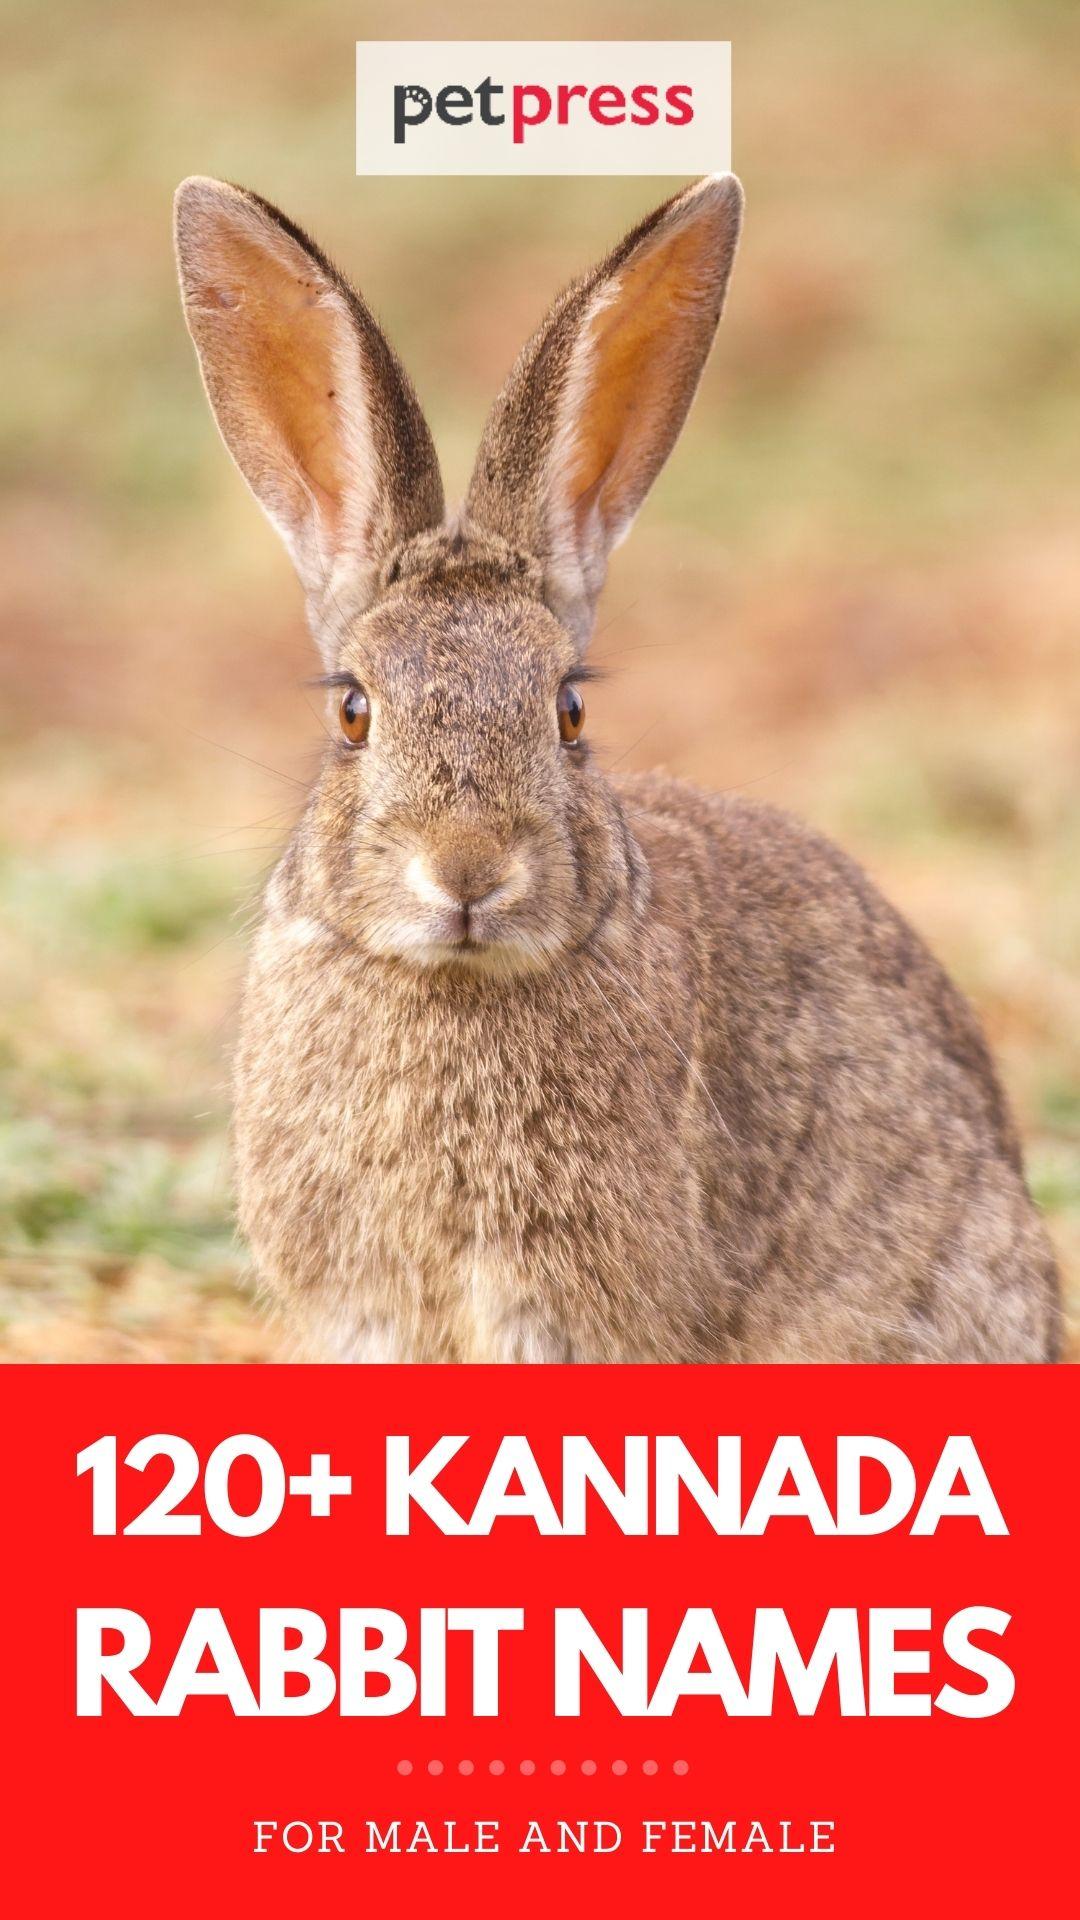 kannada rabbit names